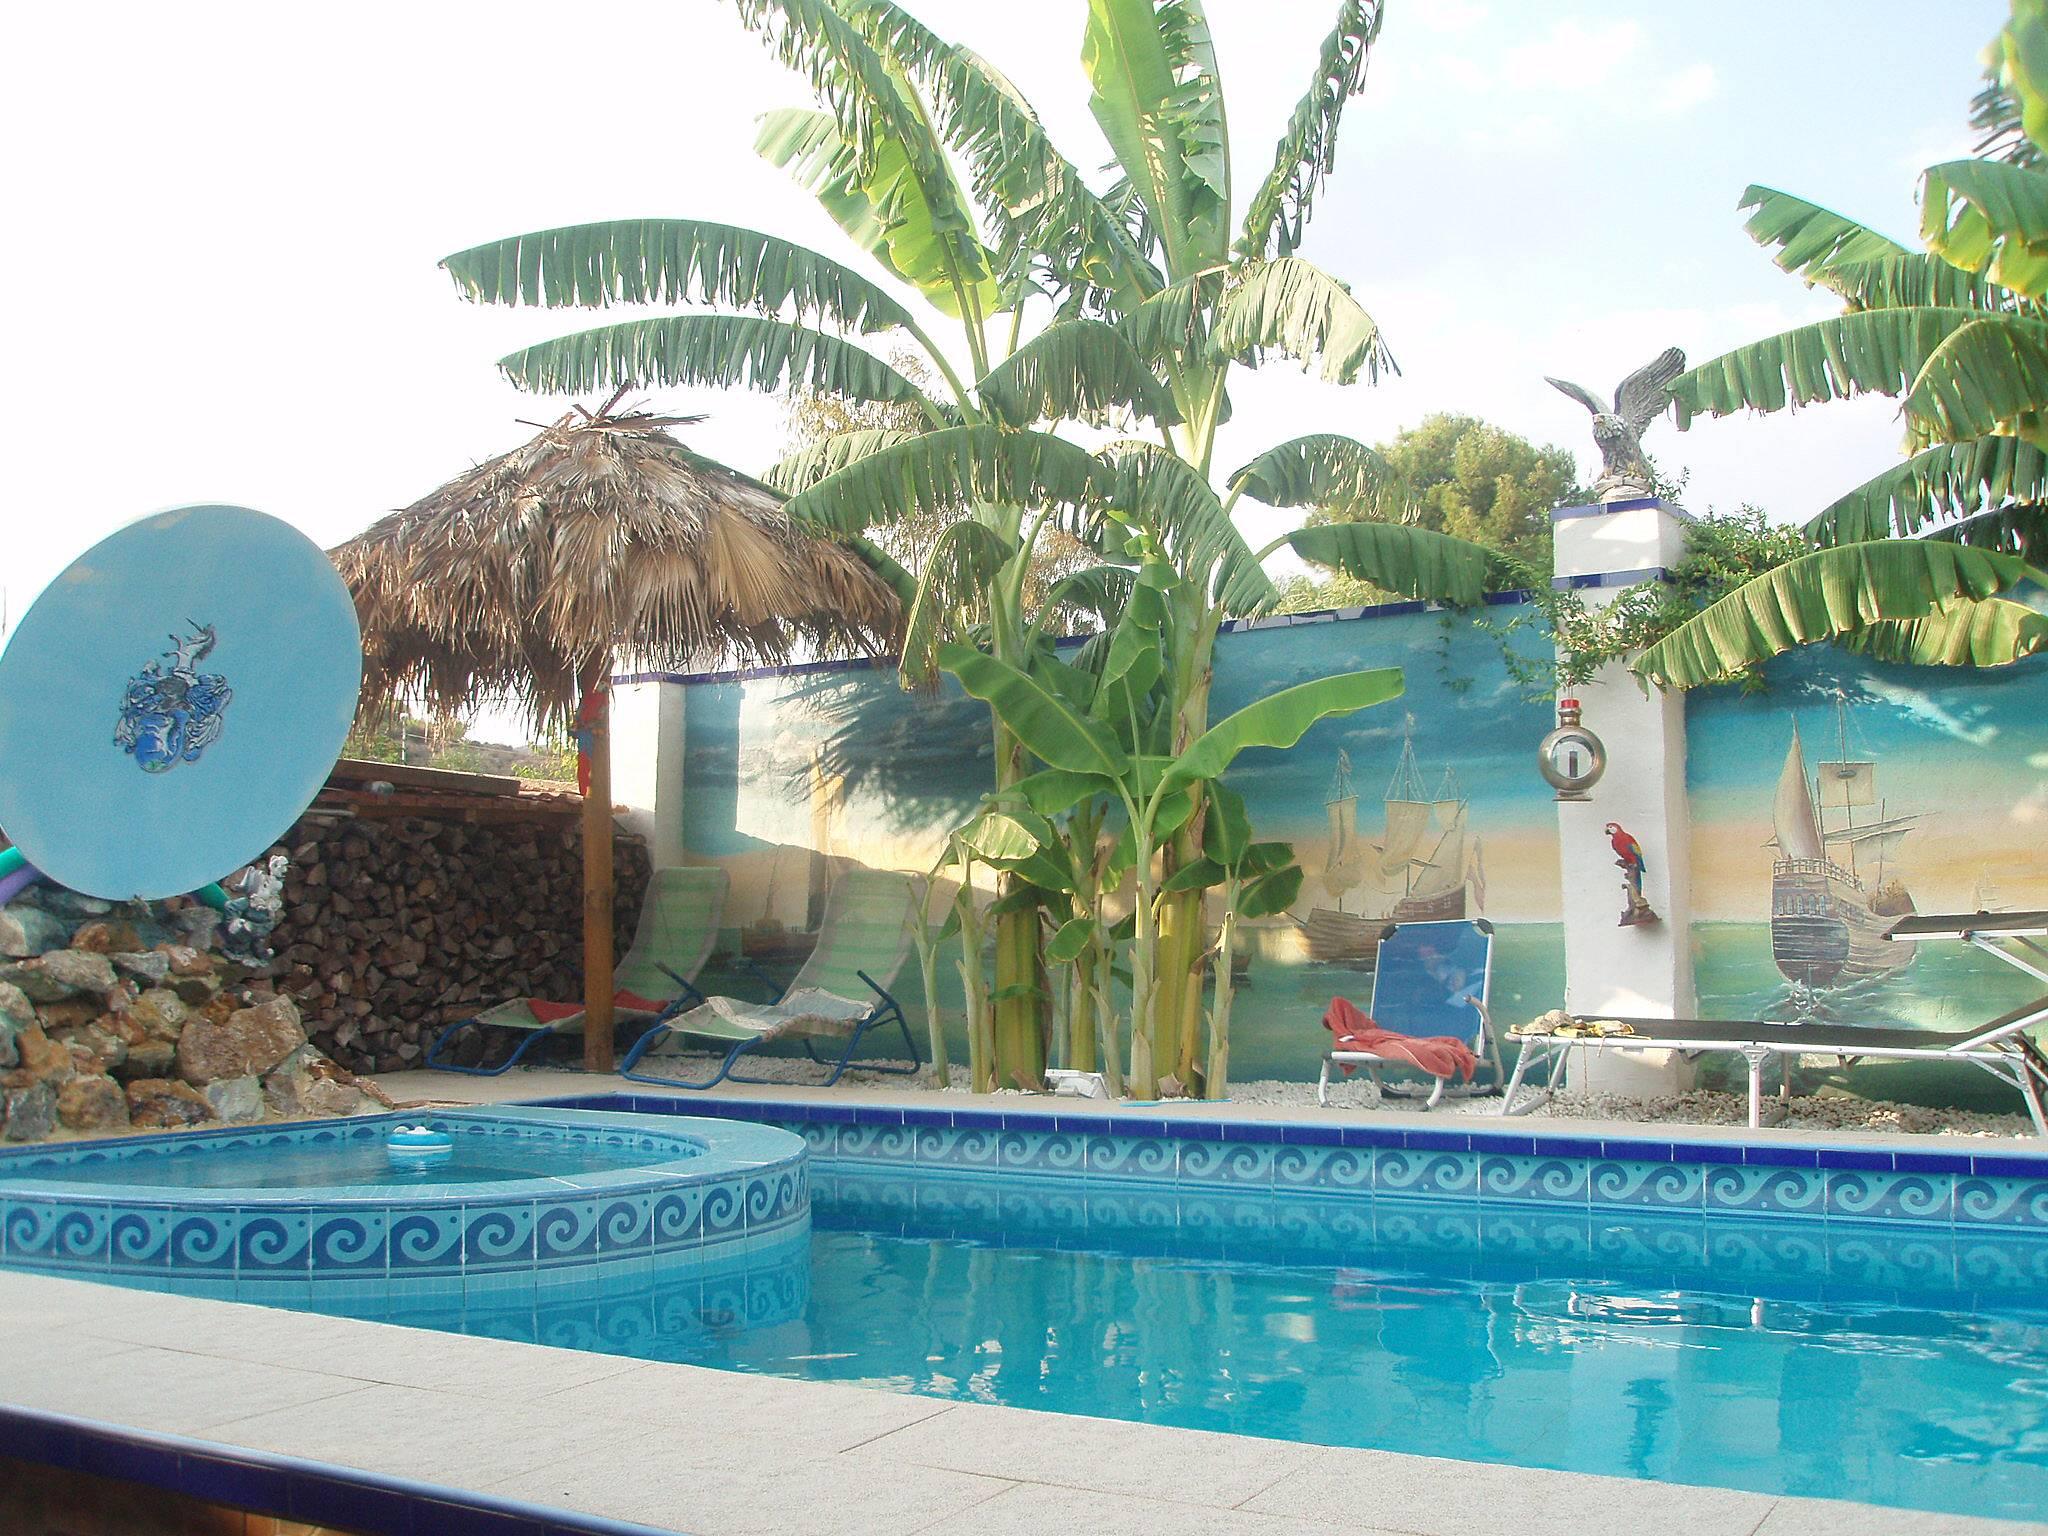 2 casas con piscina la alcoraya alicante alacant for Piscina alicante